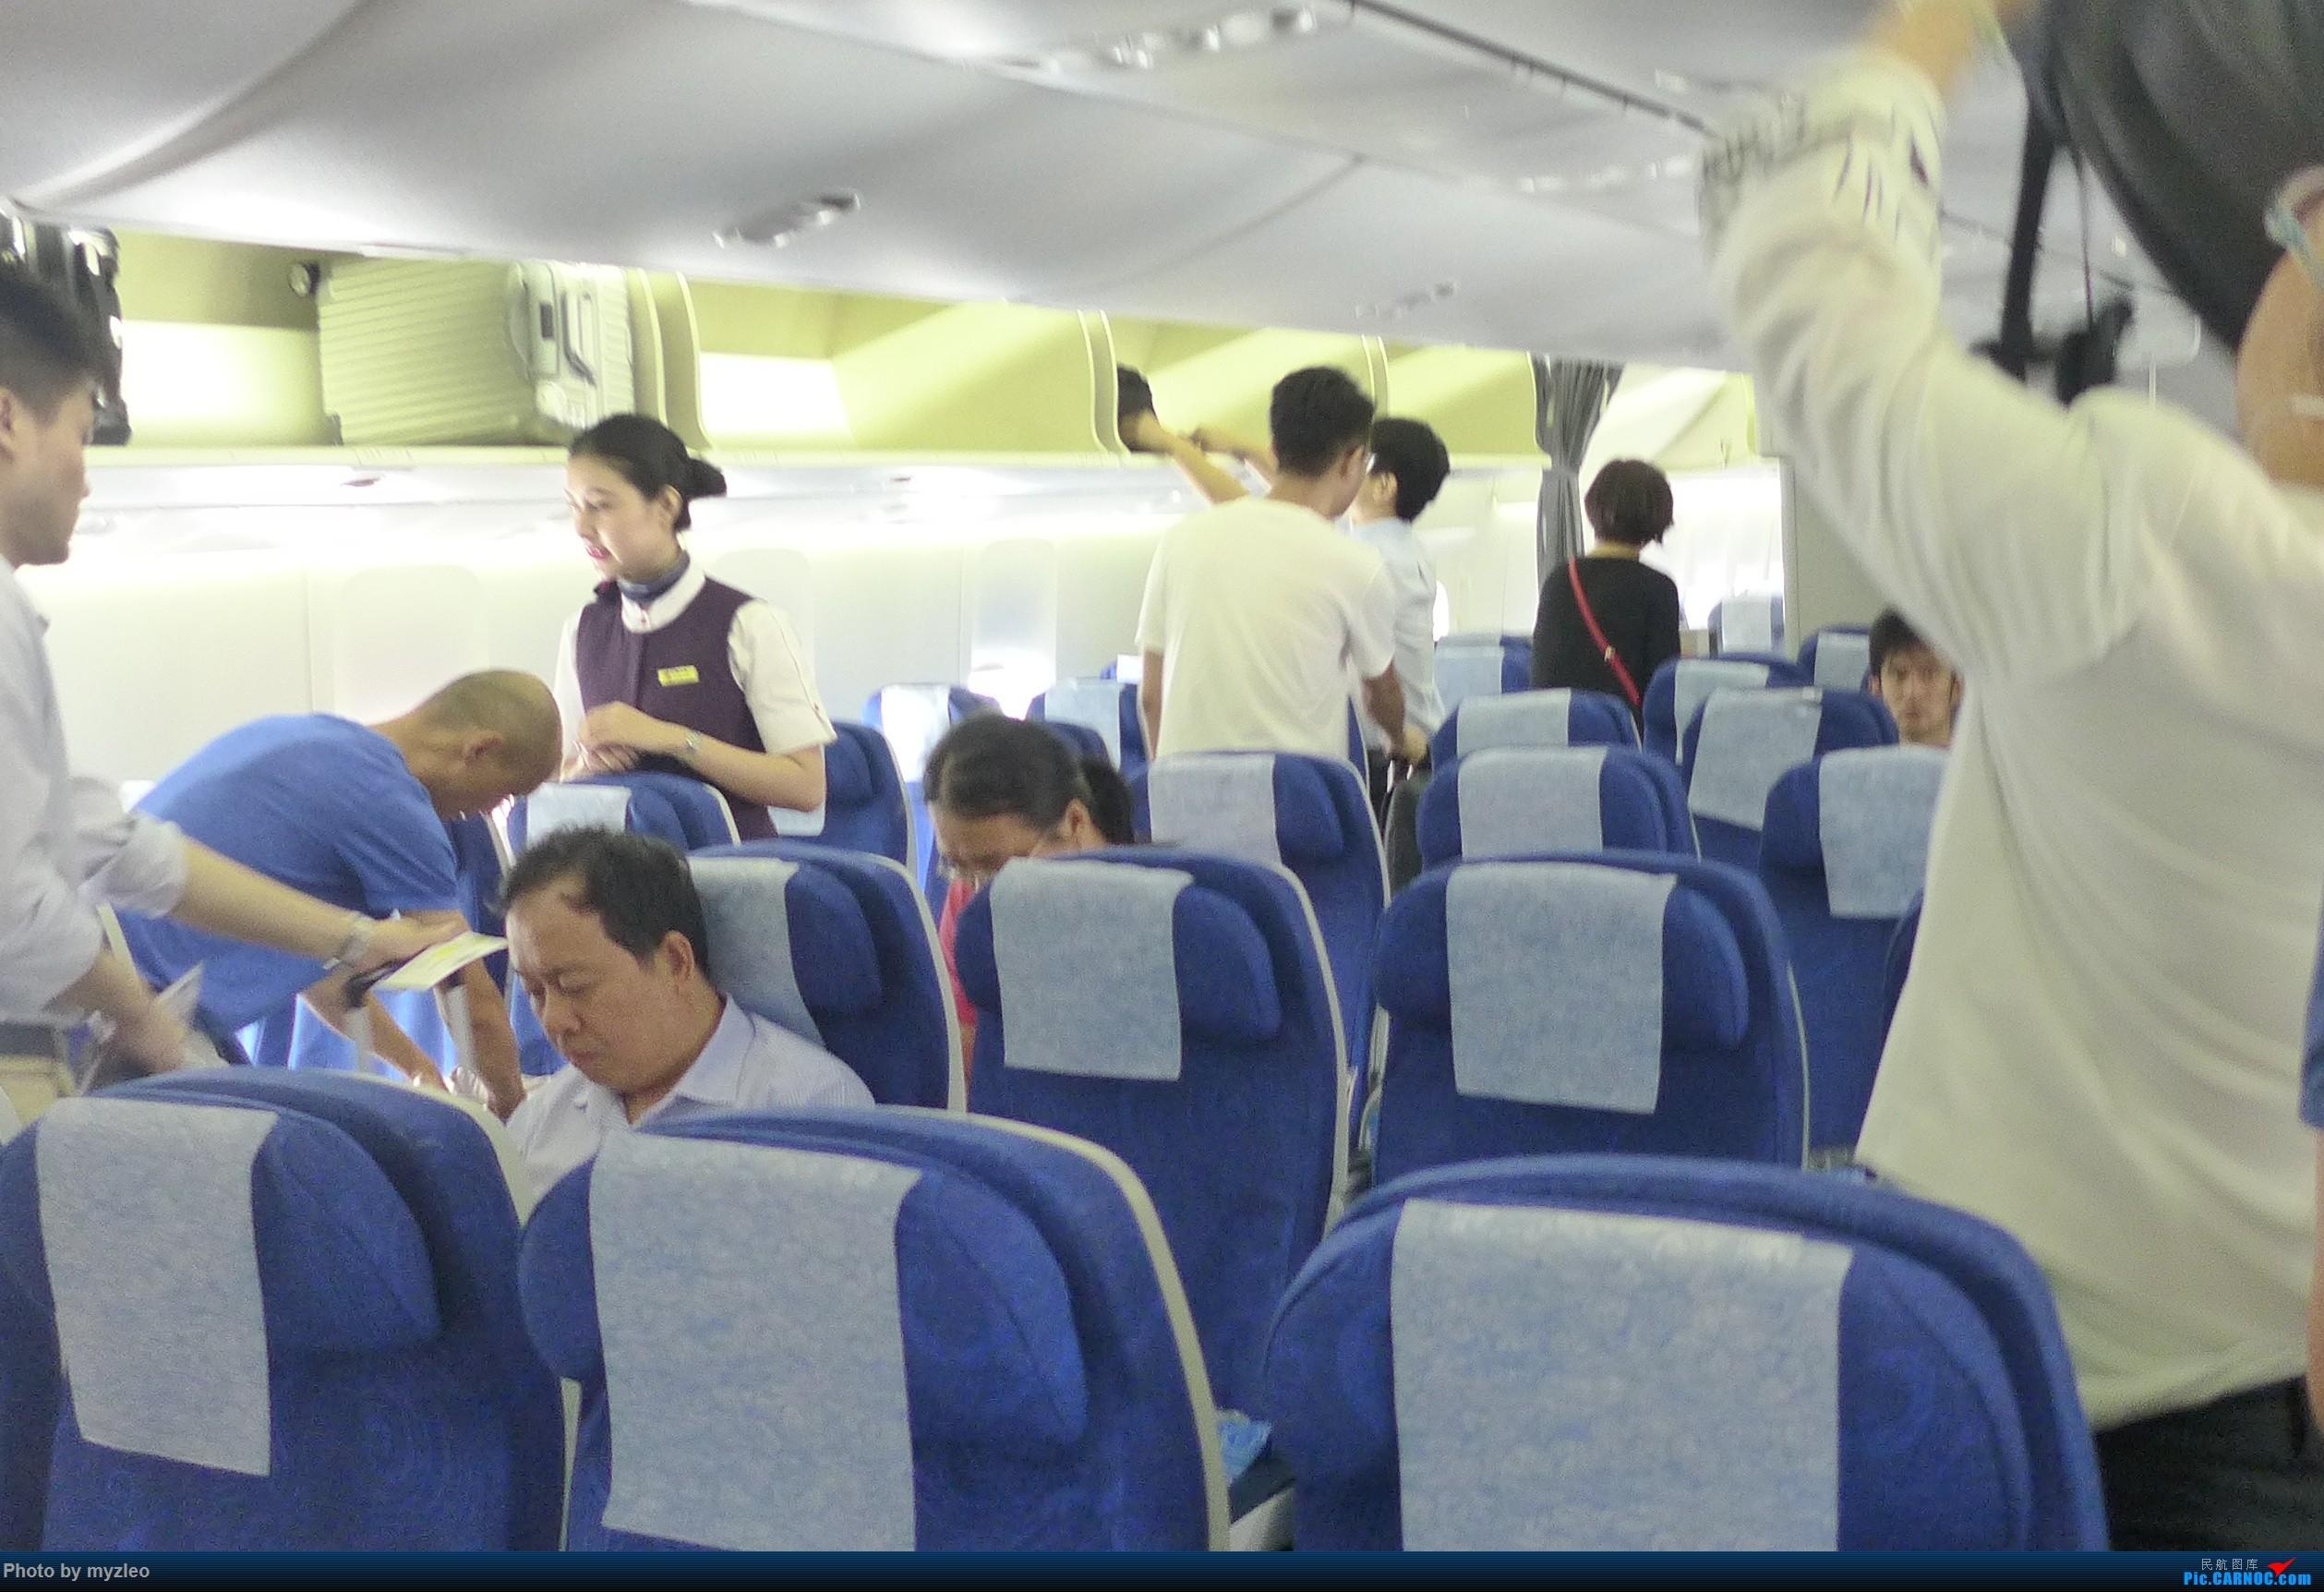 Re:[原创]【myzleo的游记3.1】三访帝都——记一次意外的惊喜,大鹅头初遇,第一次去中关村 BOEING 747-8I B-2486 中国上海虹桥国际机场